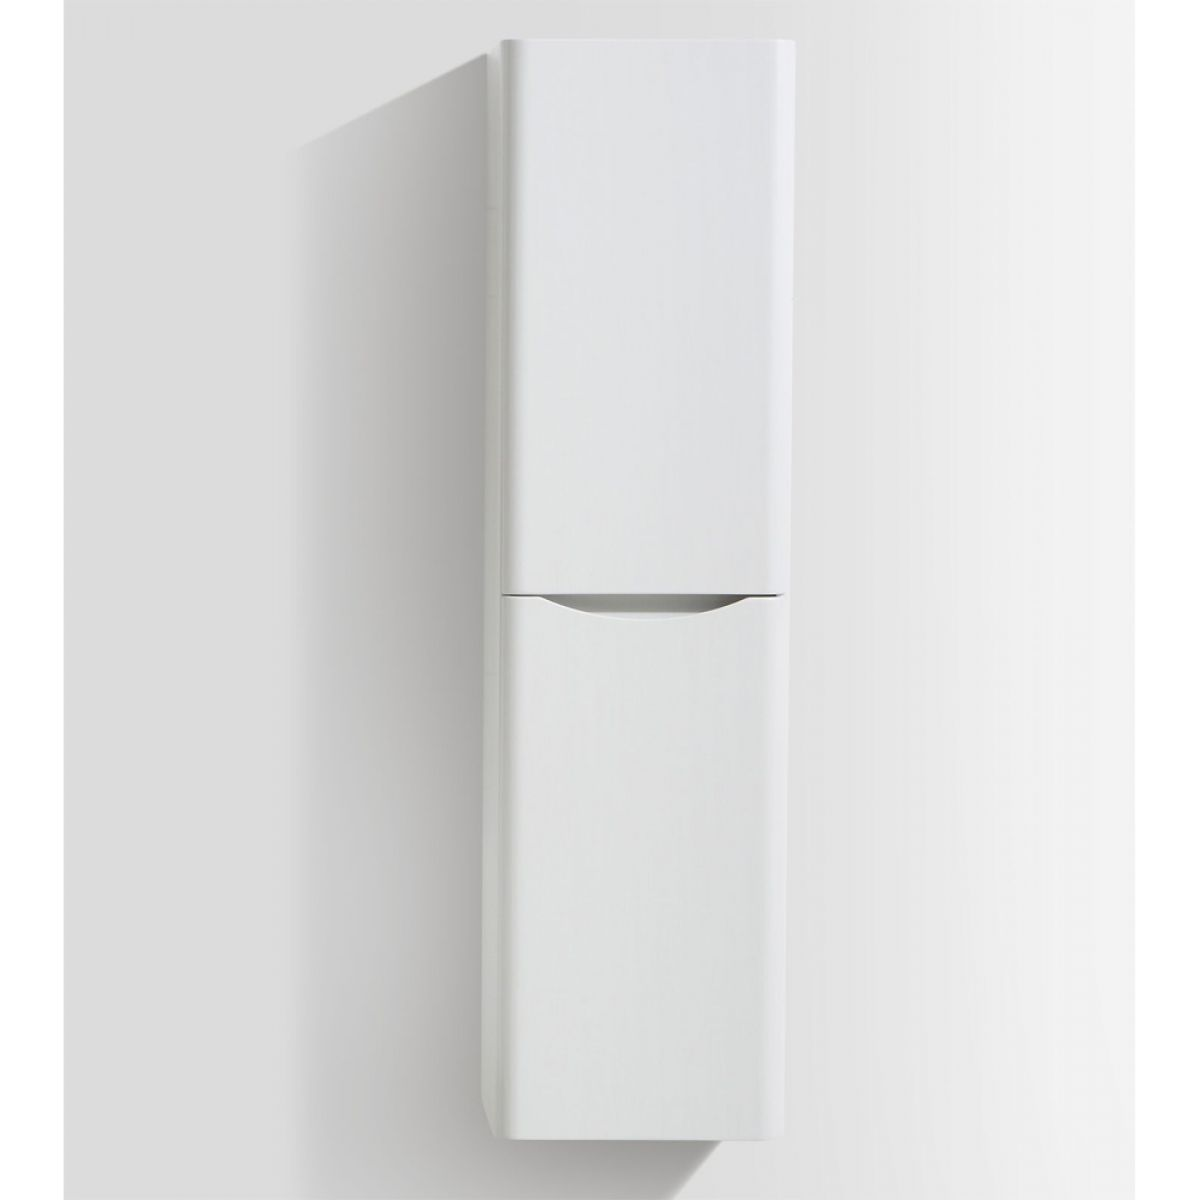 Bali White Ash Tall Storage Unit